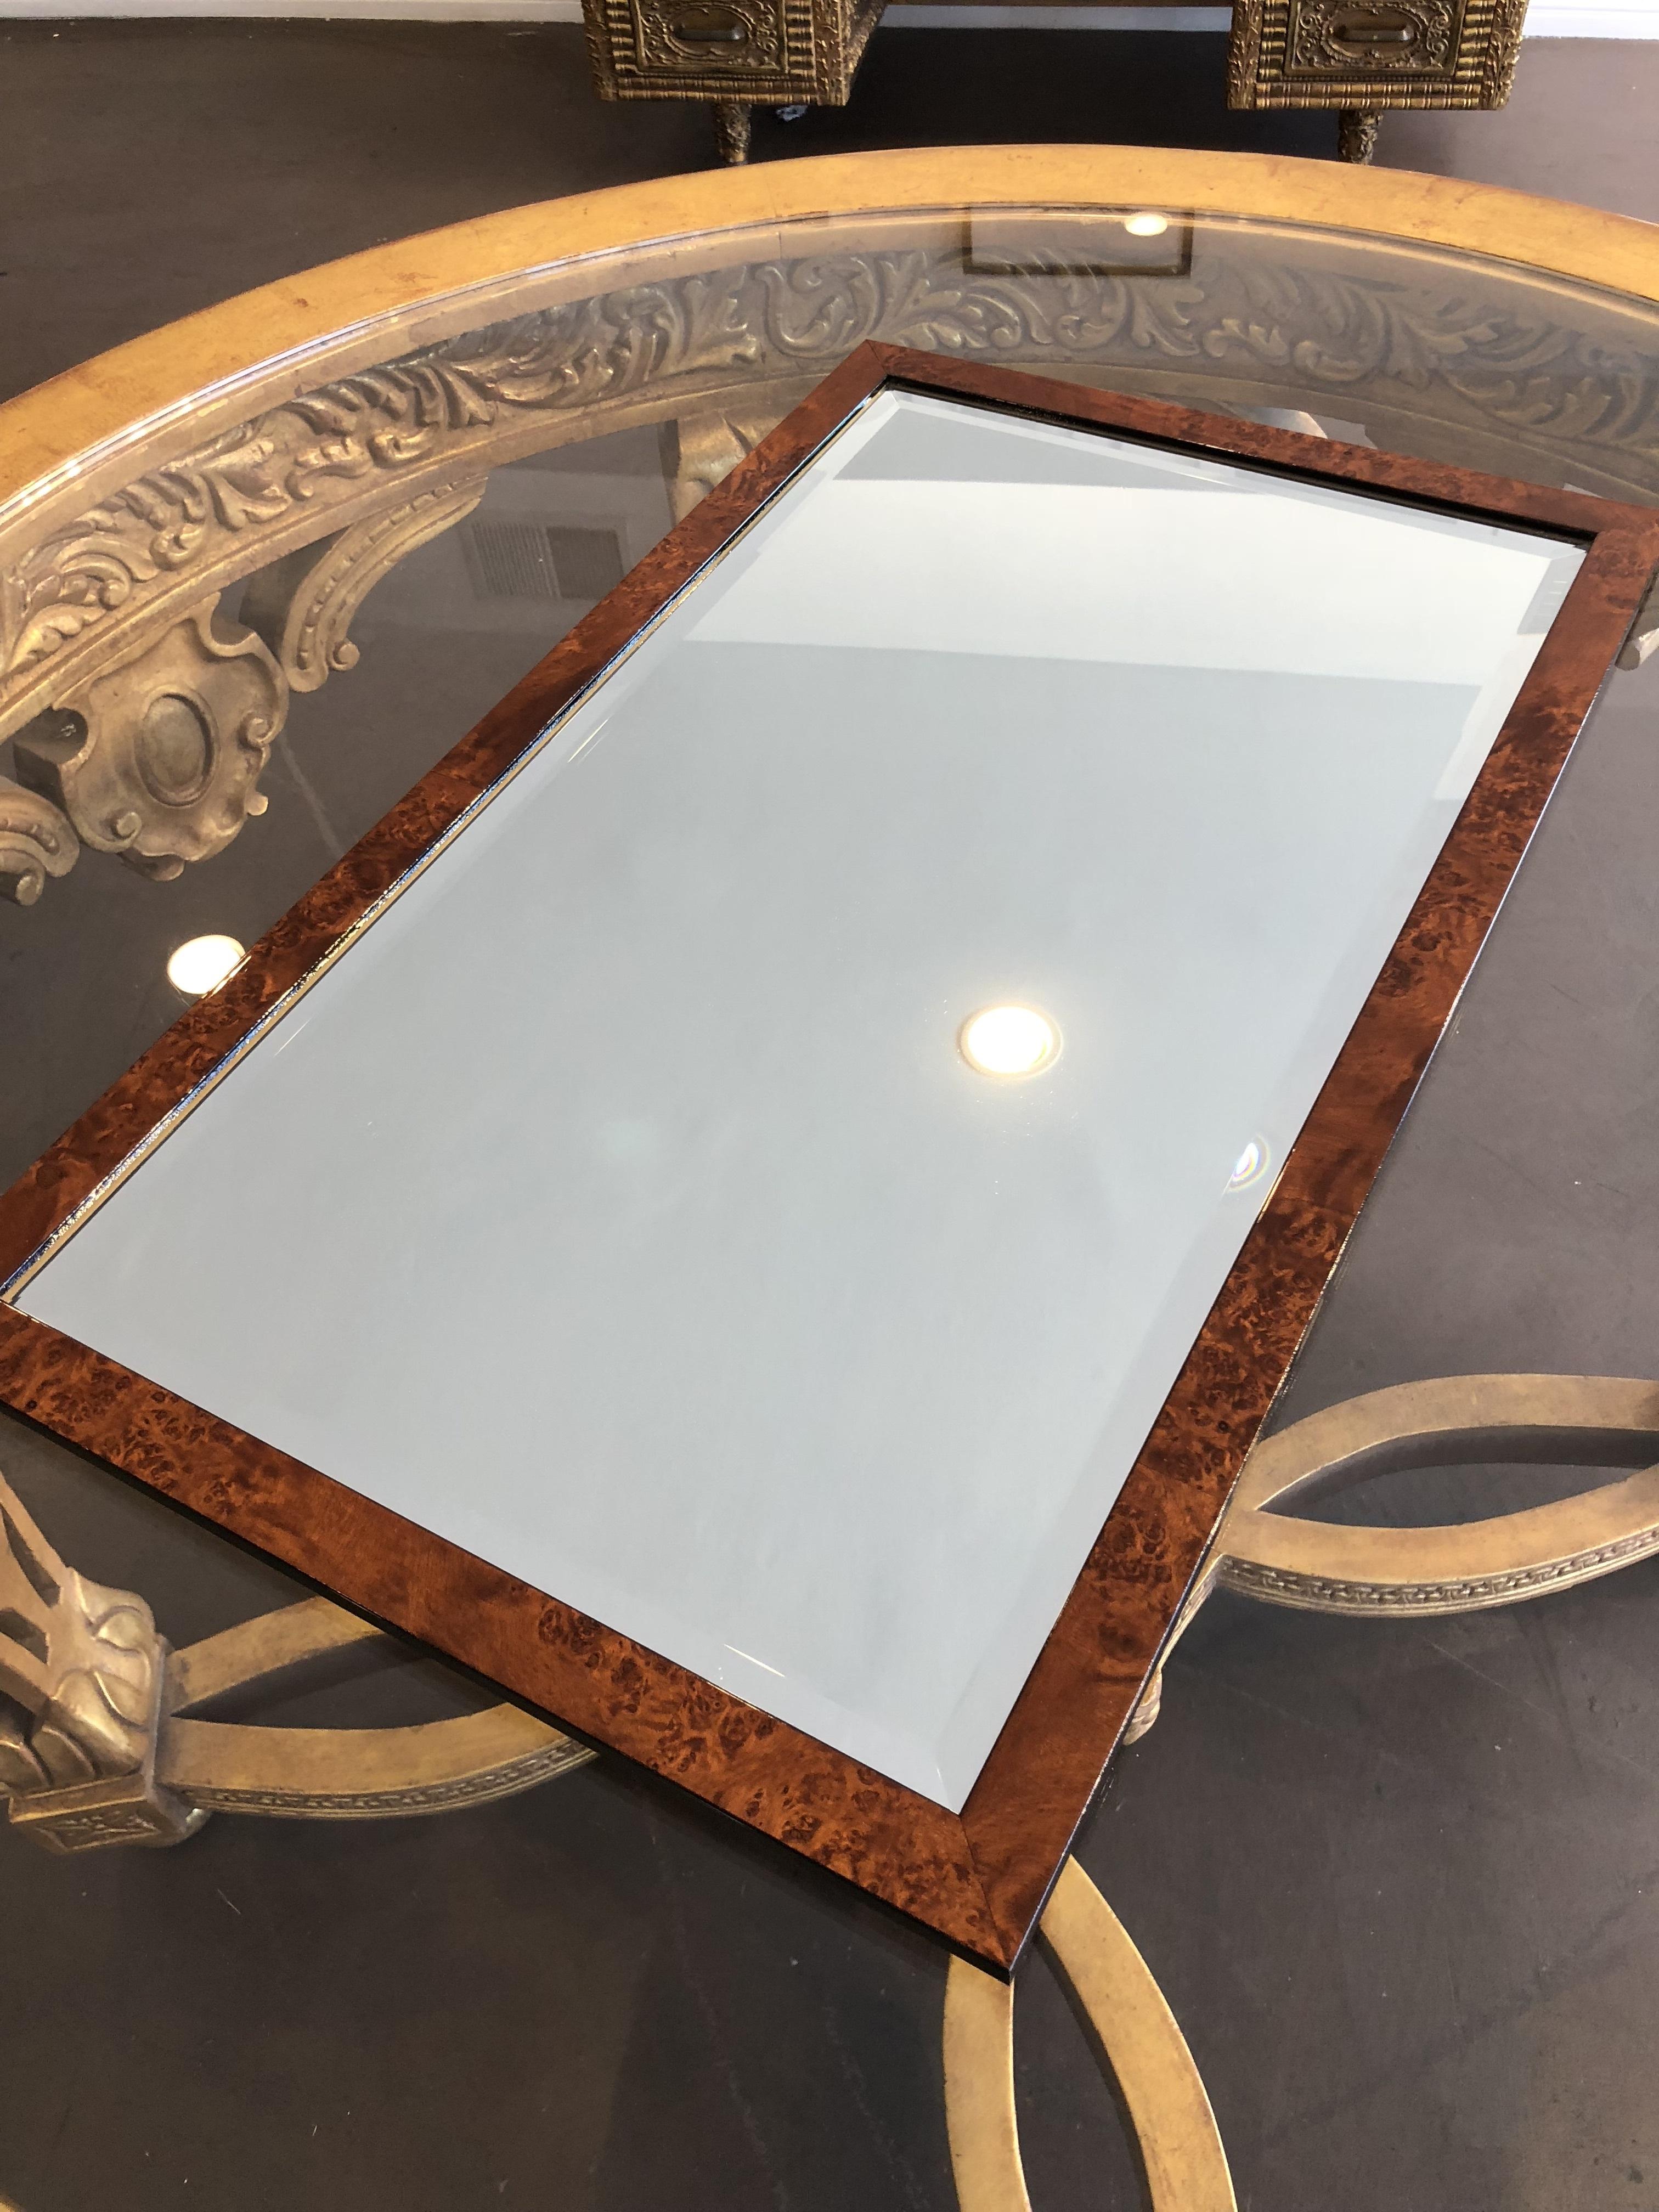 bevel-mirror-liz-alkon-3.jpg